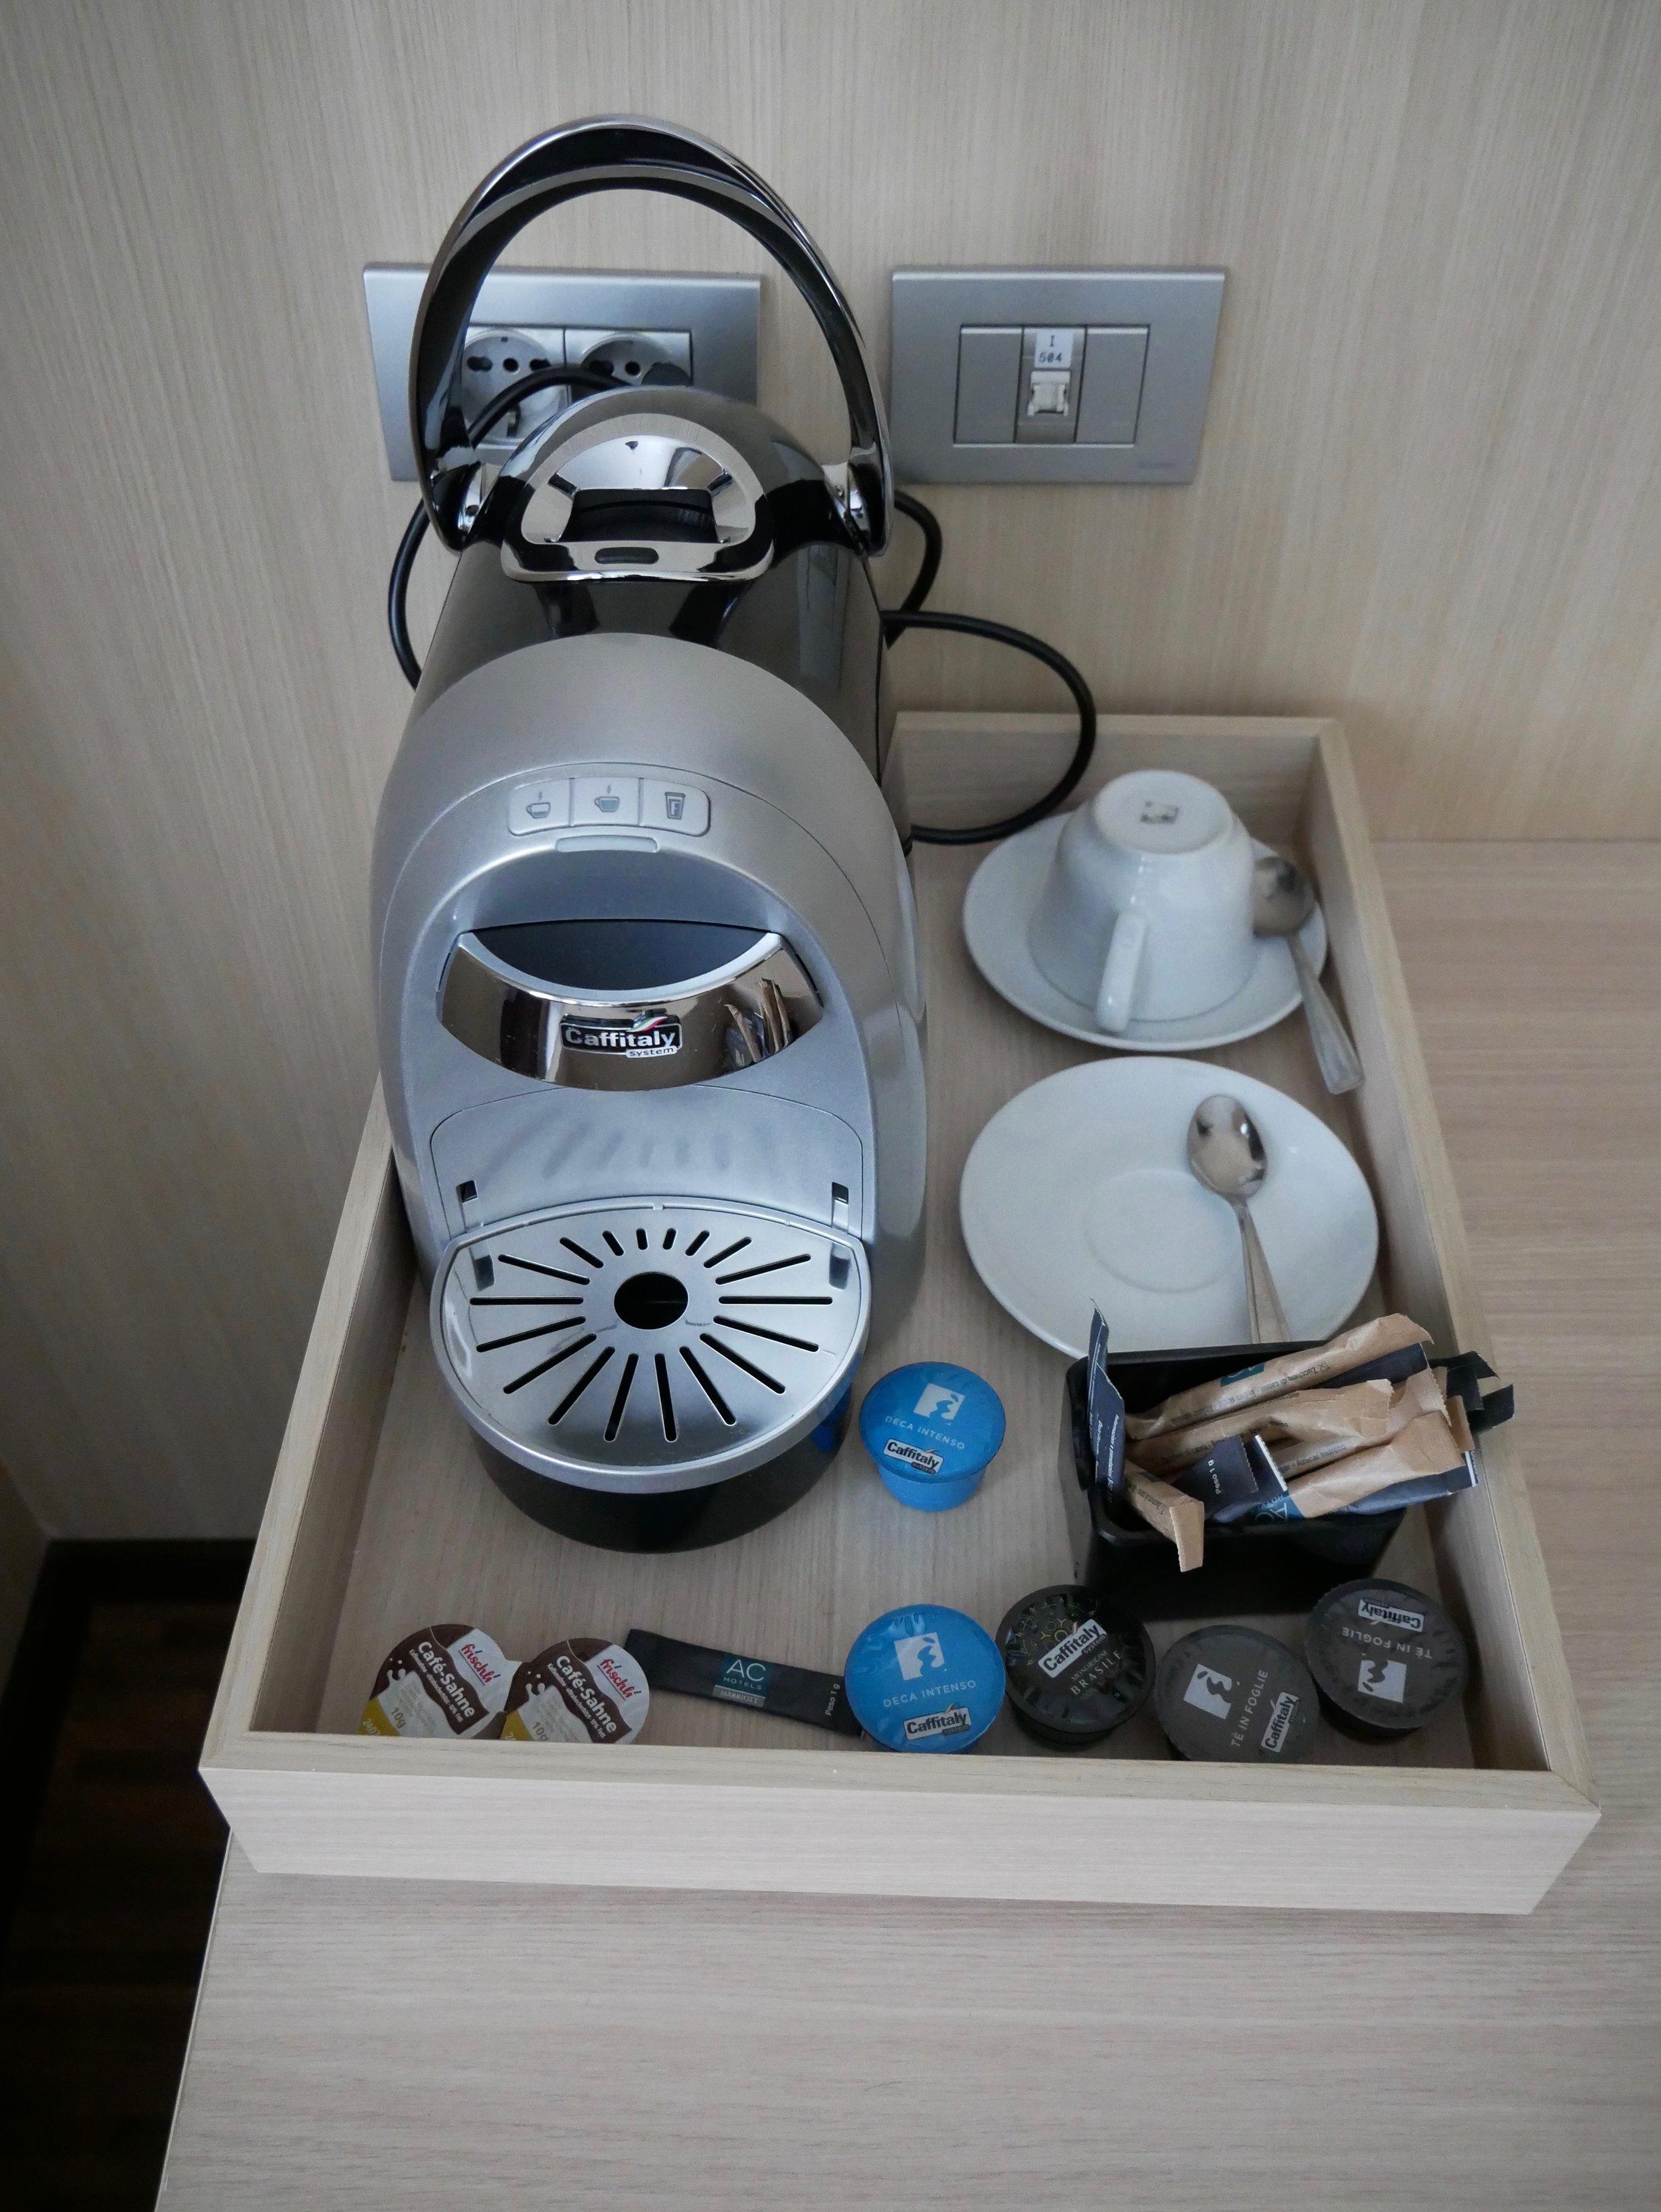 AC Hotel Milano coffee